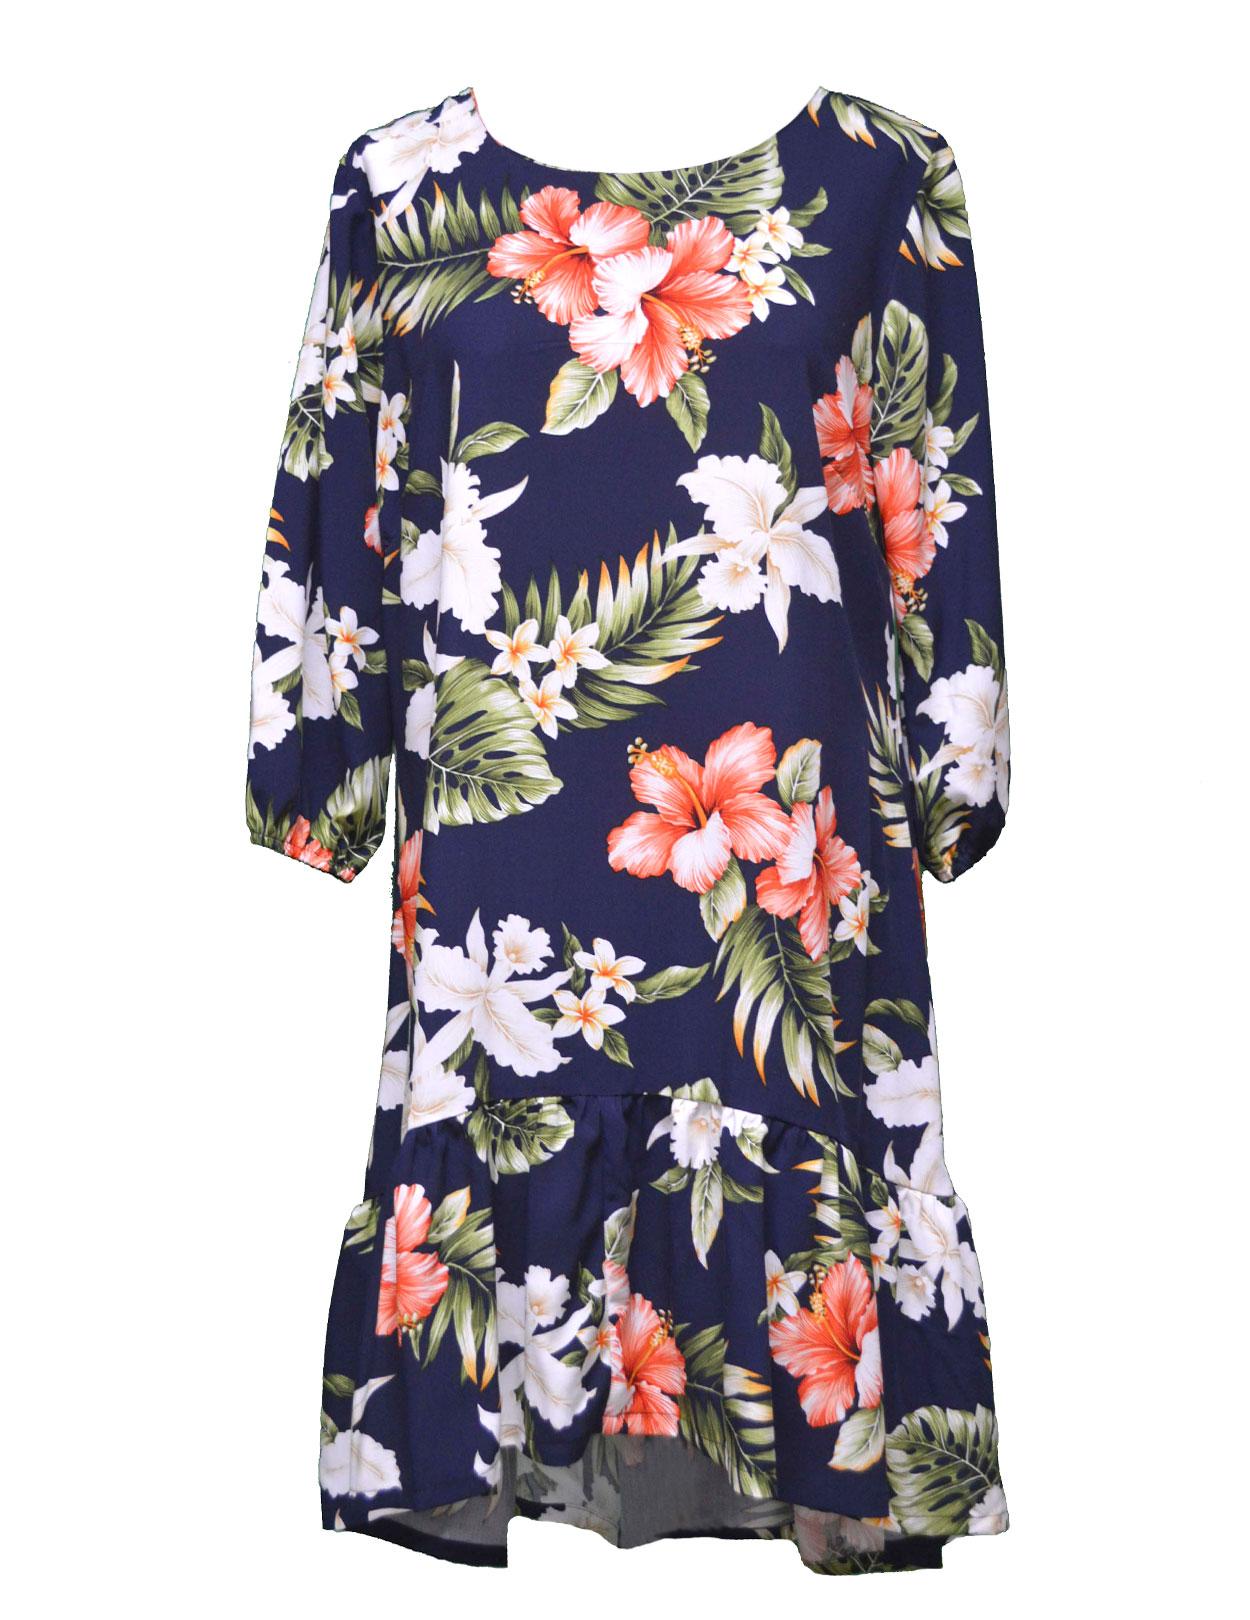 74c6cfaef56 Pupukea Hibiscus Short Flower Dress with 3 4 Sleeves  Shaka Time Hawaii  Clothing Store